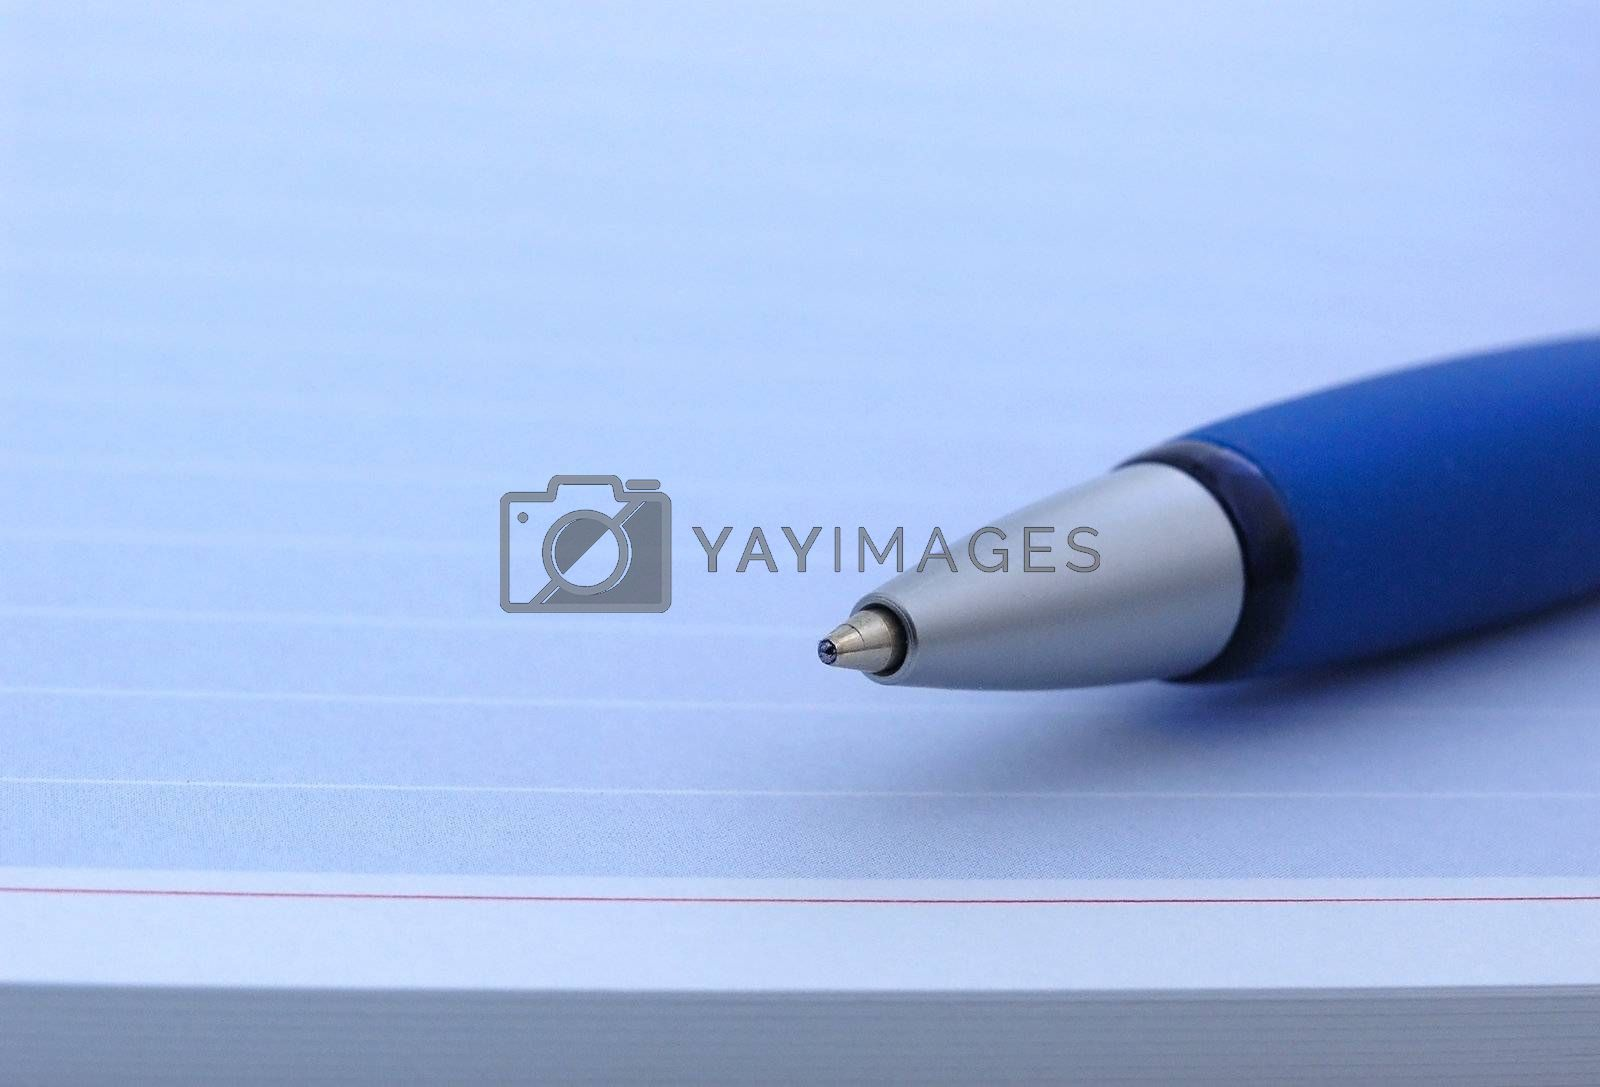 blue pen on a blue notebook